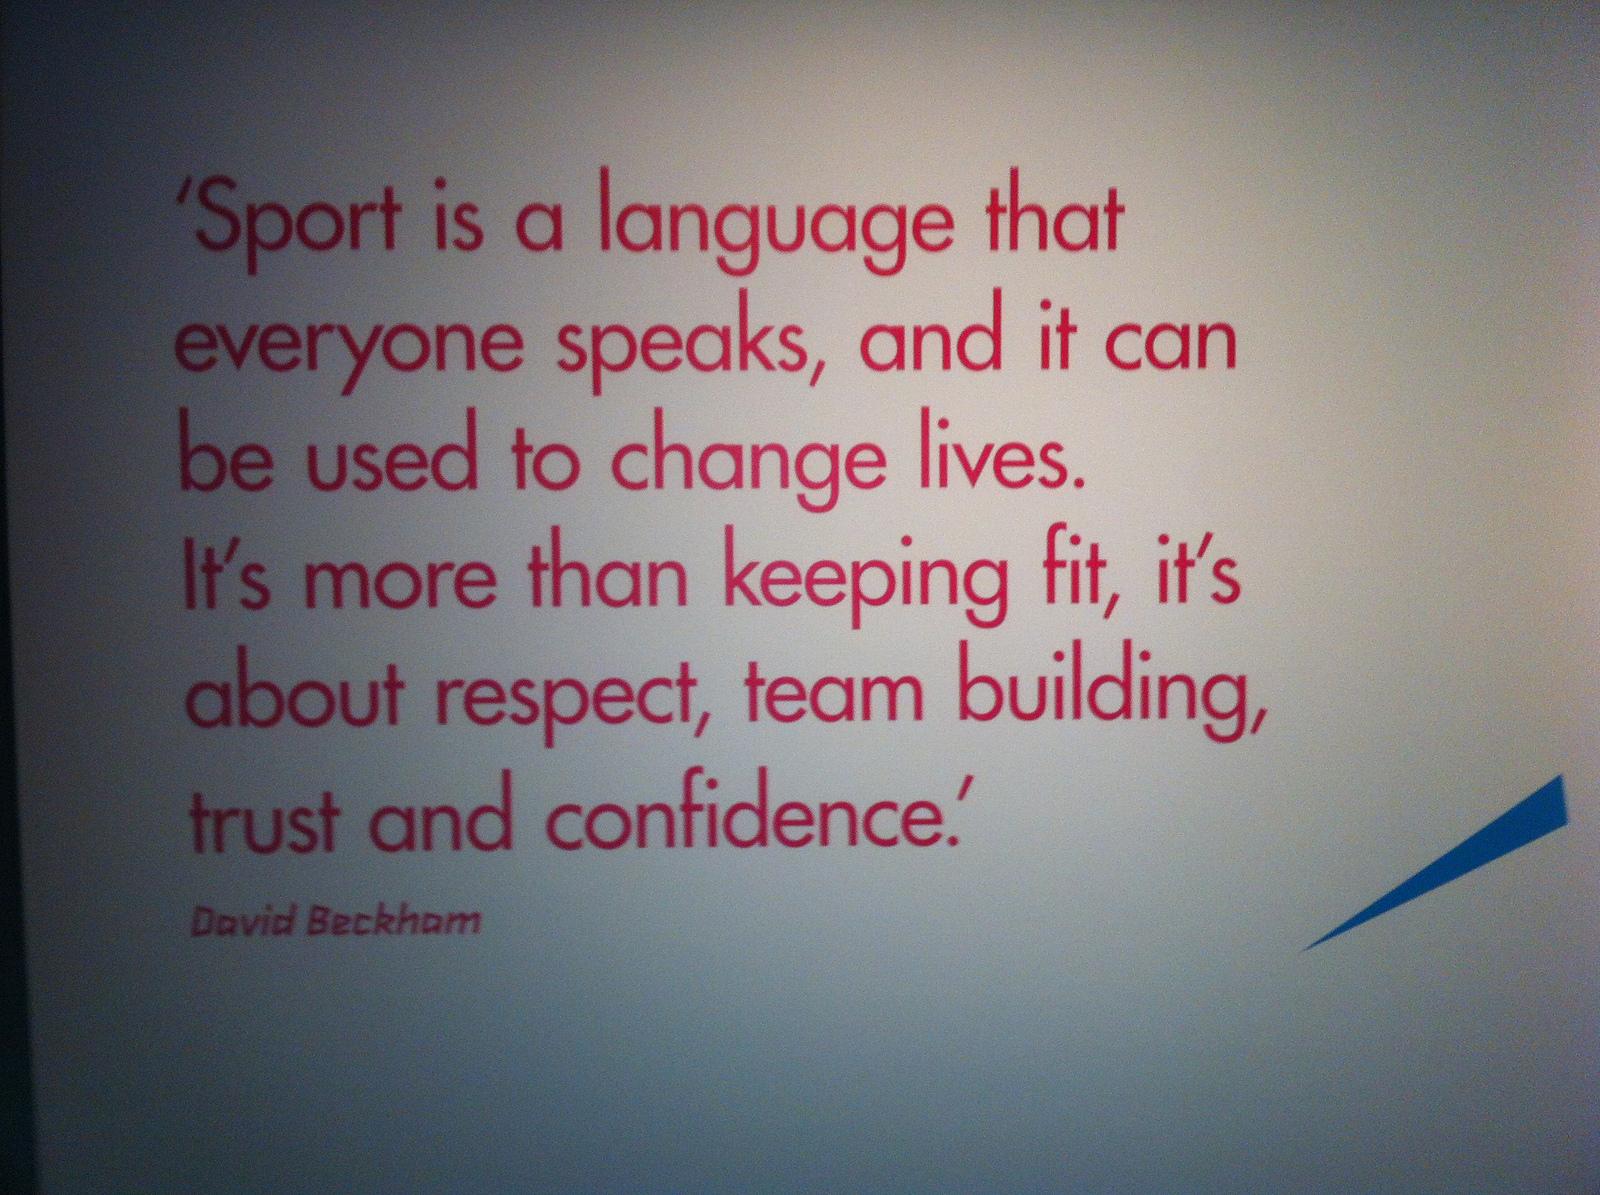 David Beckham's quote #1